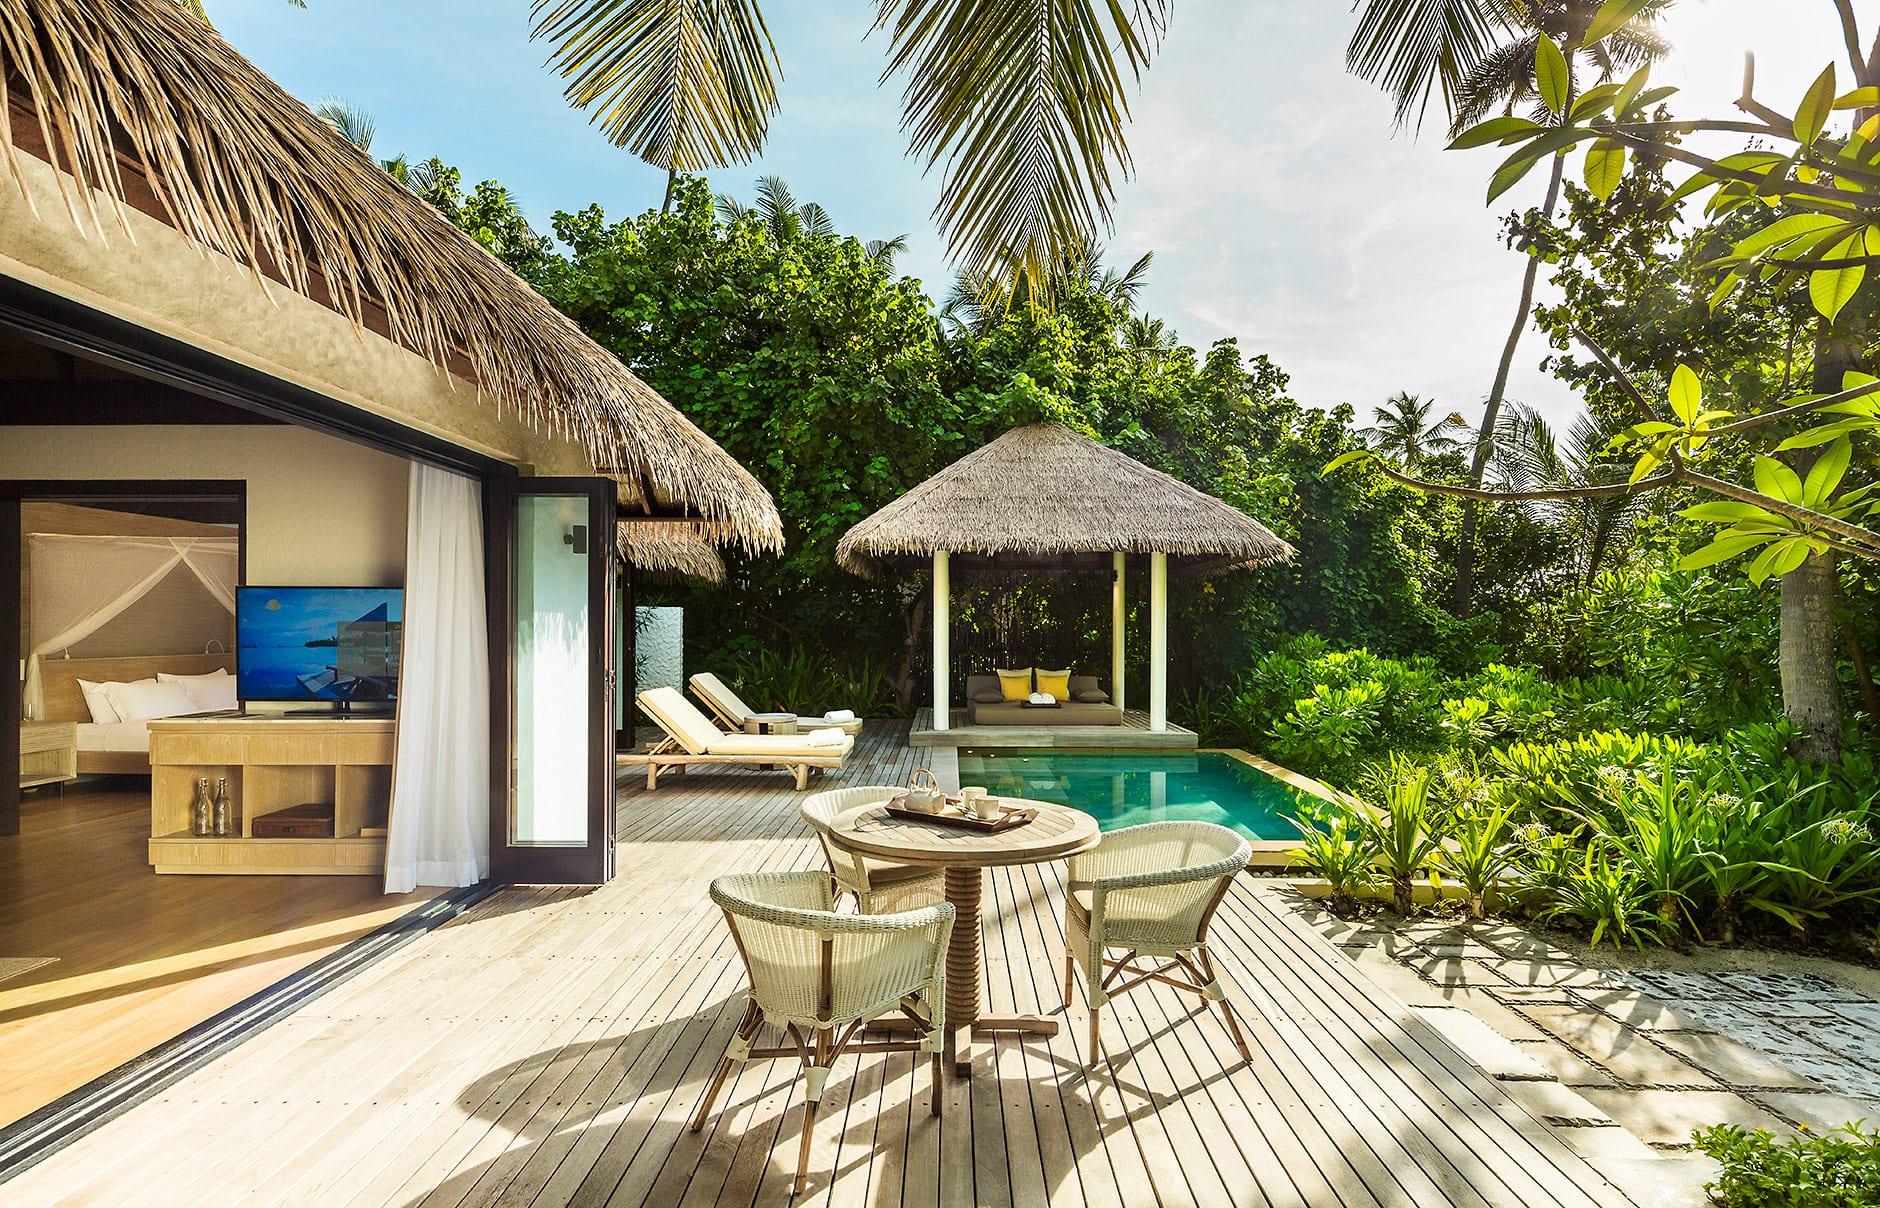 Garden Room. Maalifushi by COMO, Maldives. © COMO Hotels & Resorts